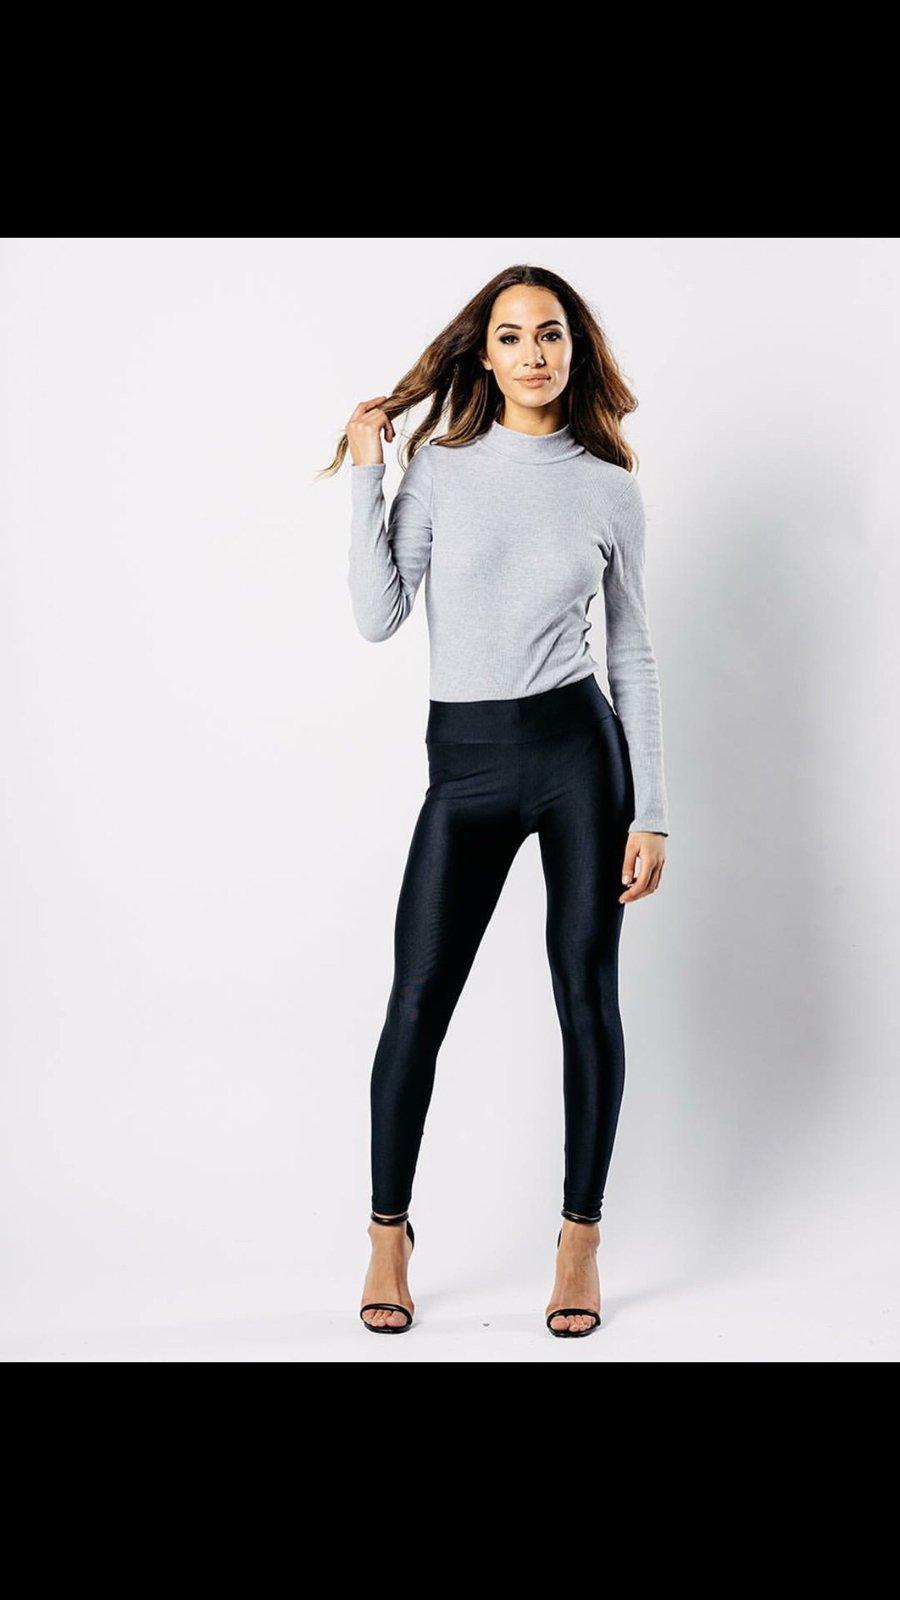 Image of Black disco pants